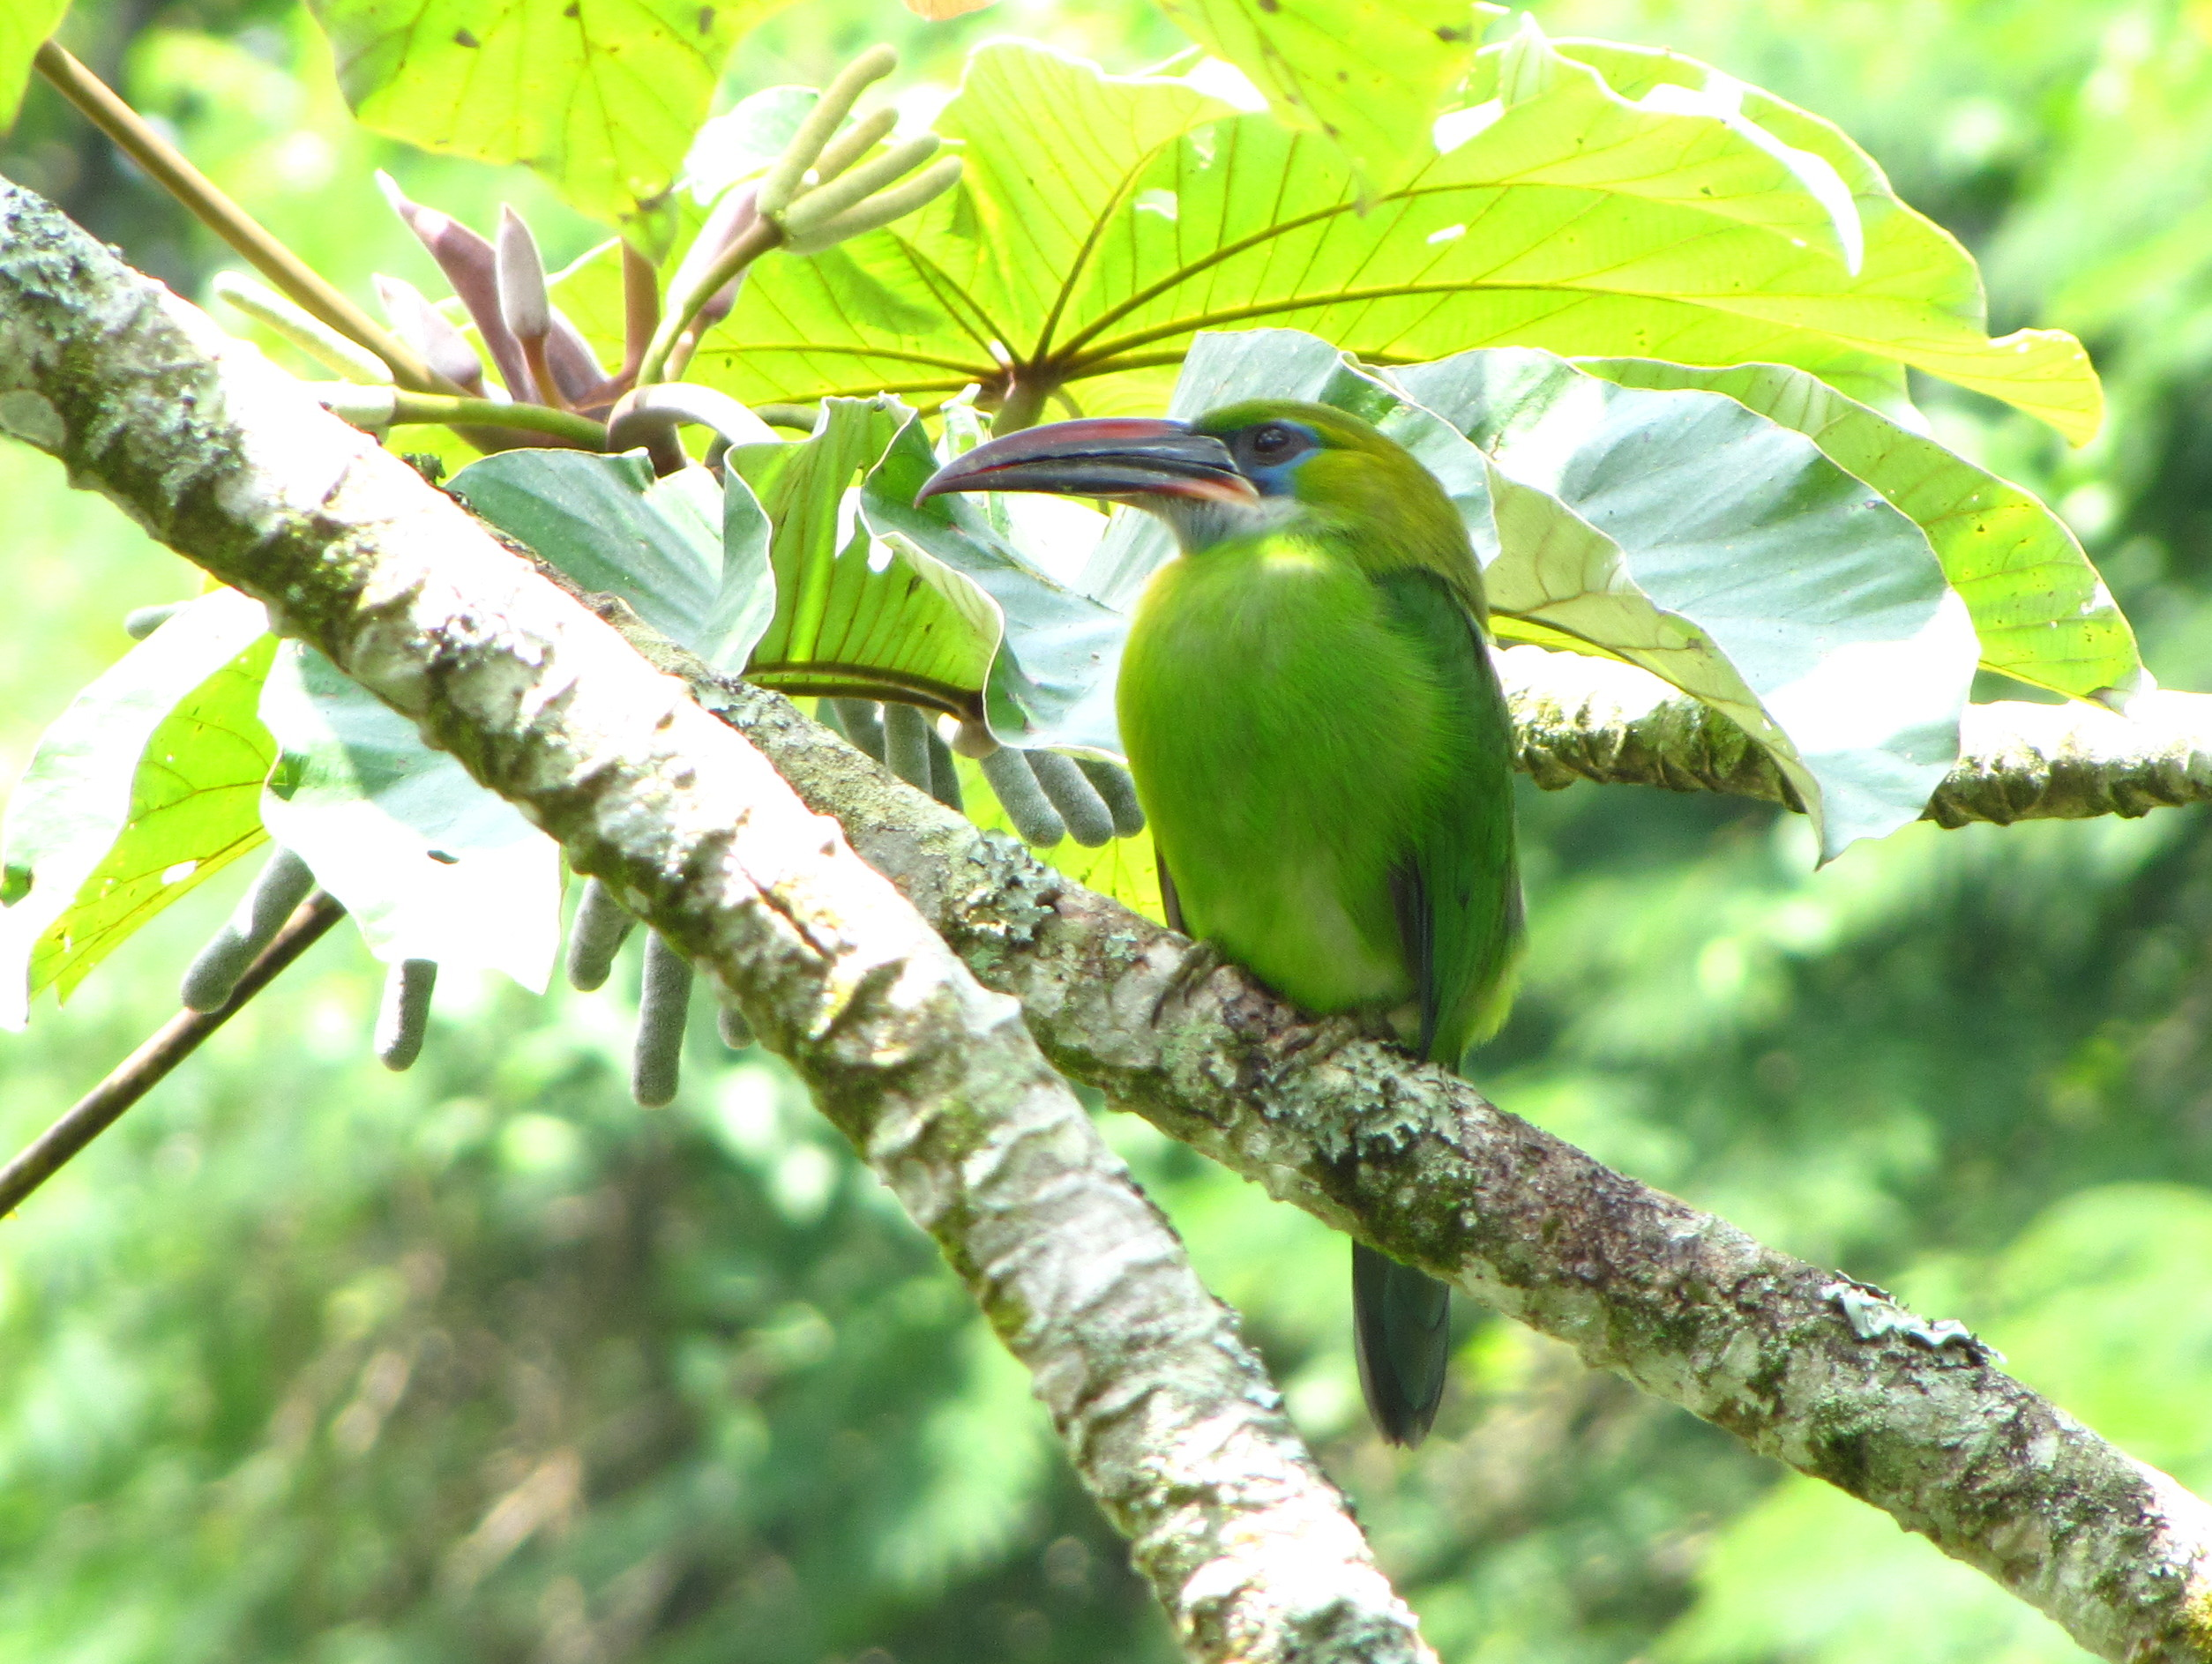 https://upload.wikimedia.org/wikipedia/commons/5/57/Aulacorhynchus_sulcatus_-Aragua_State_-Venezuela-8.jpg